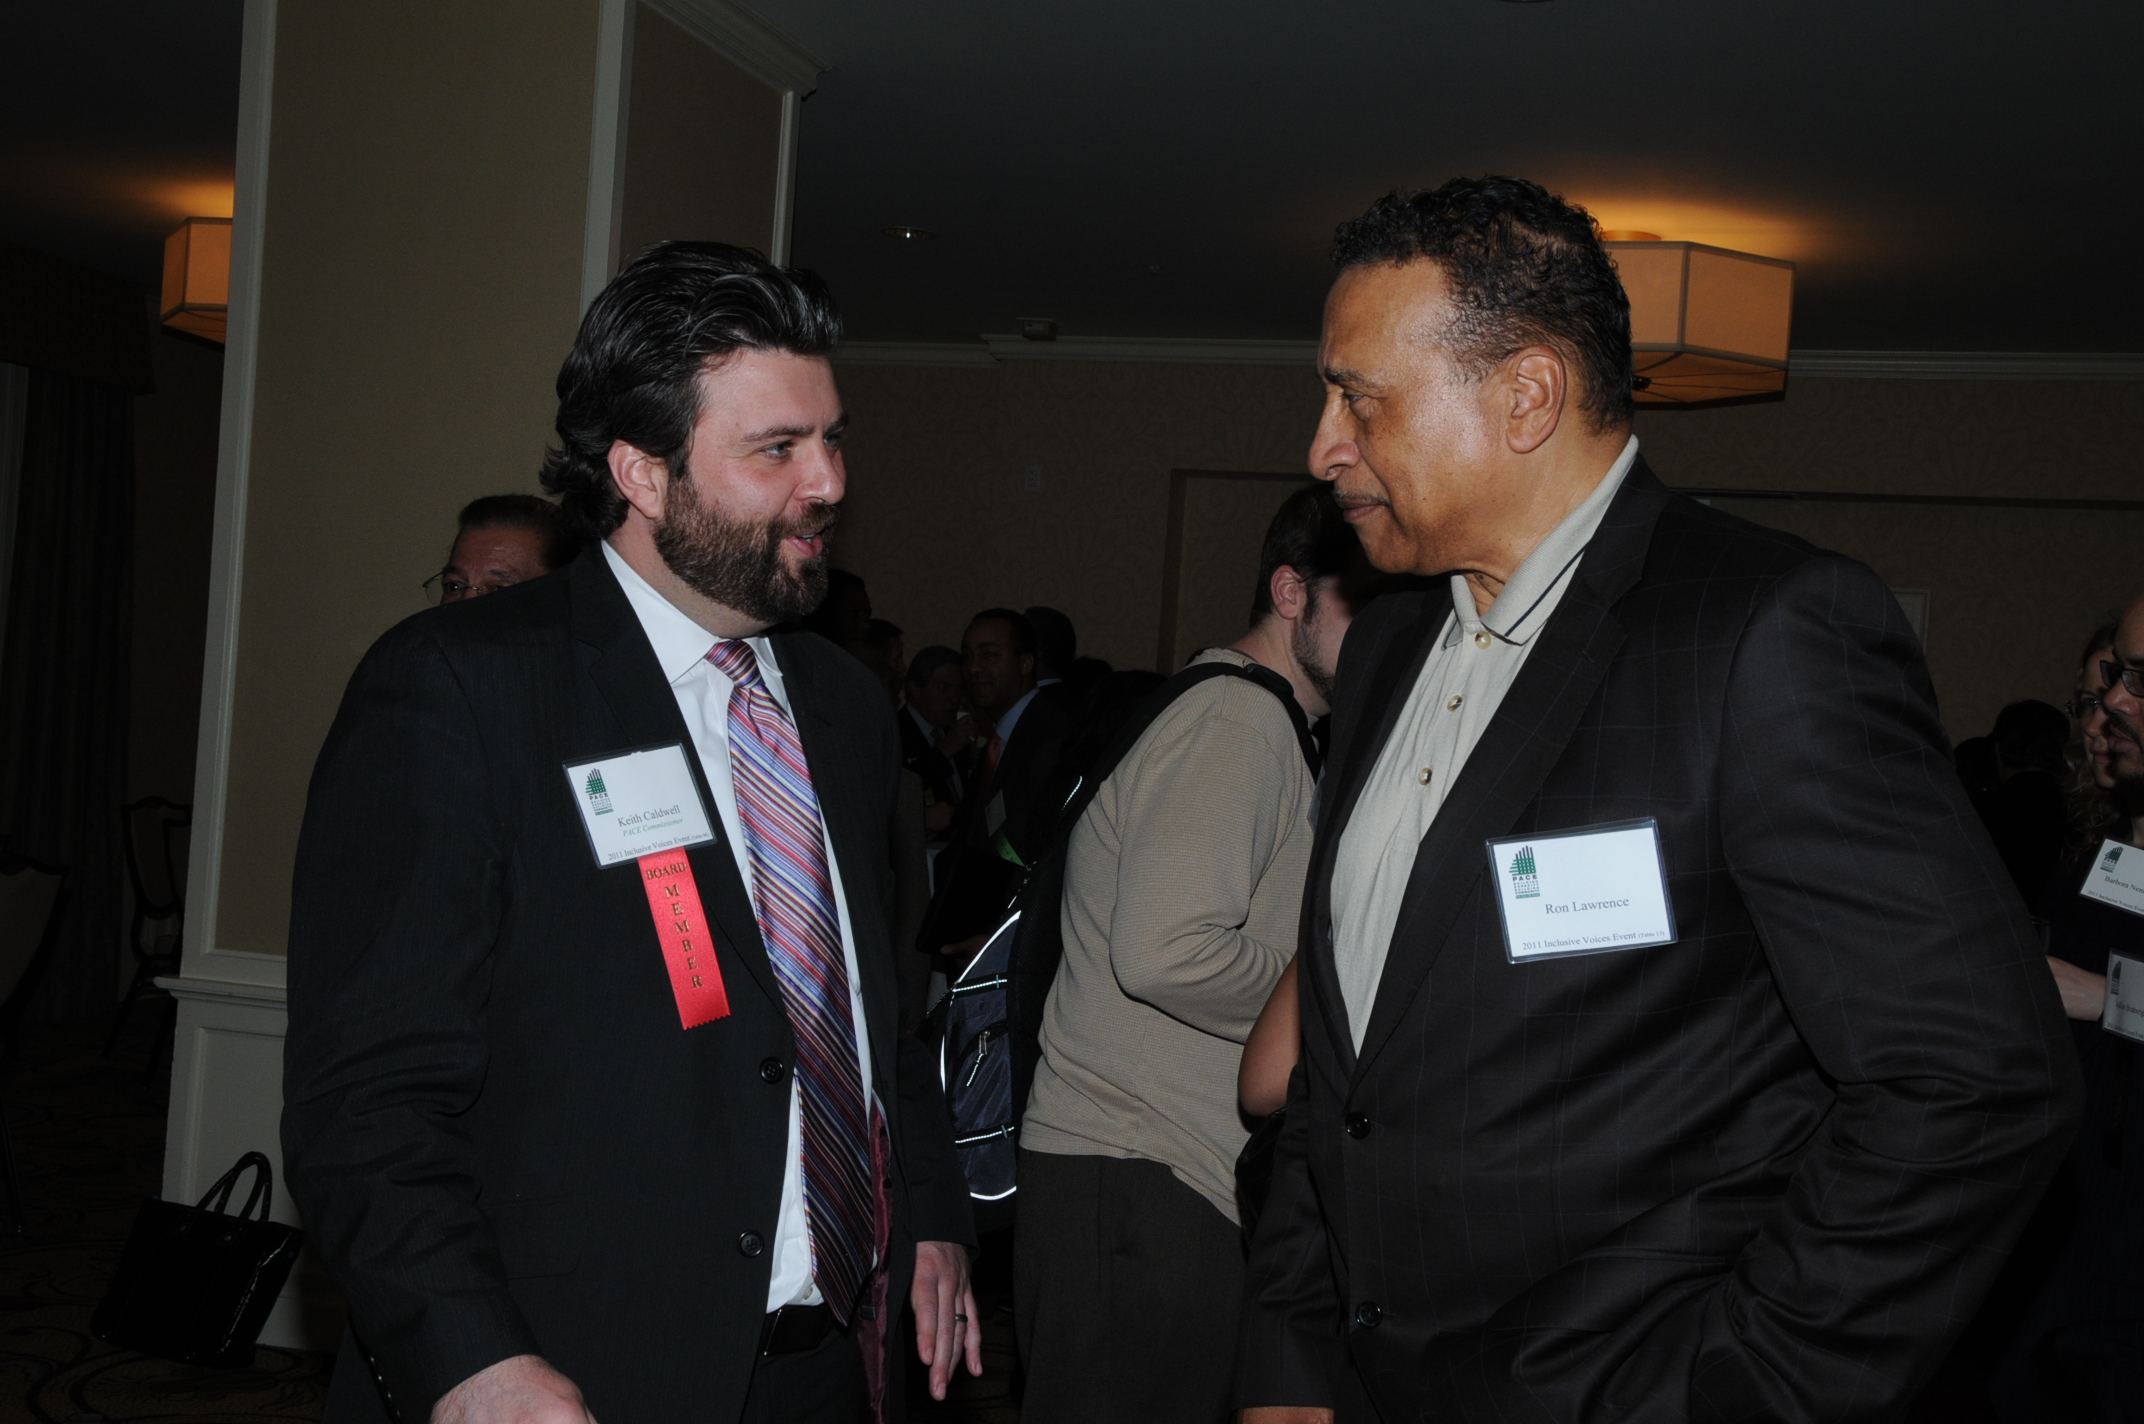 Keith Caldwell & Ron Lawrence.JPG